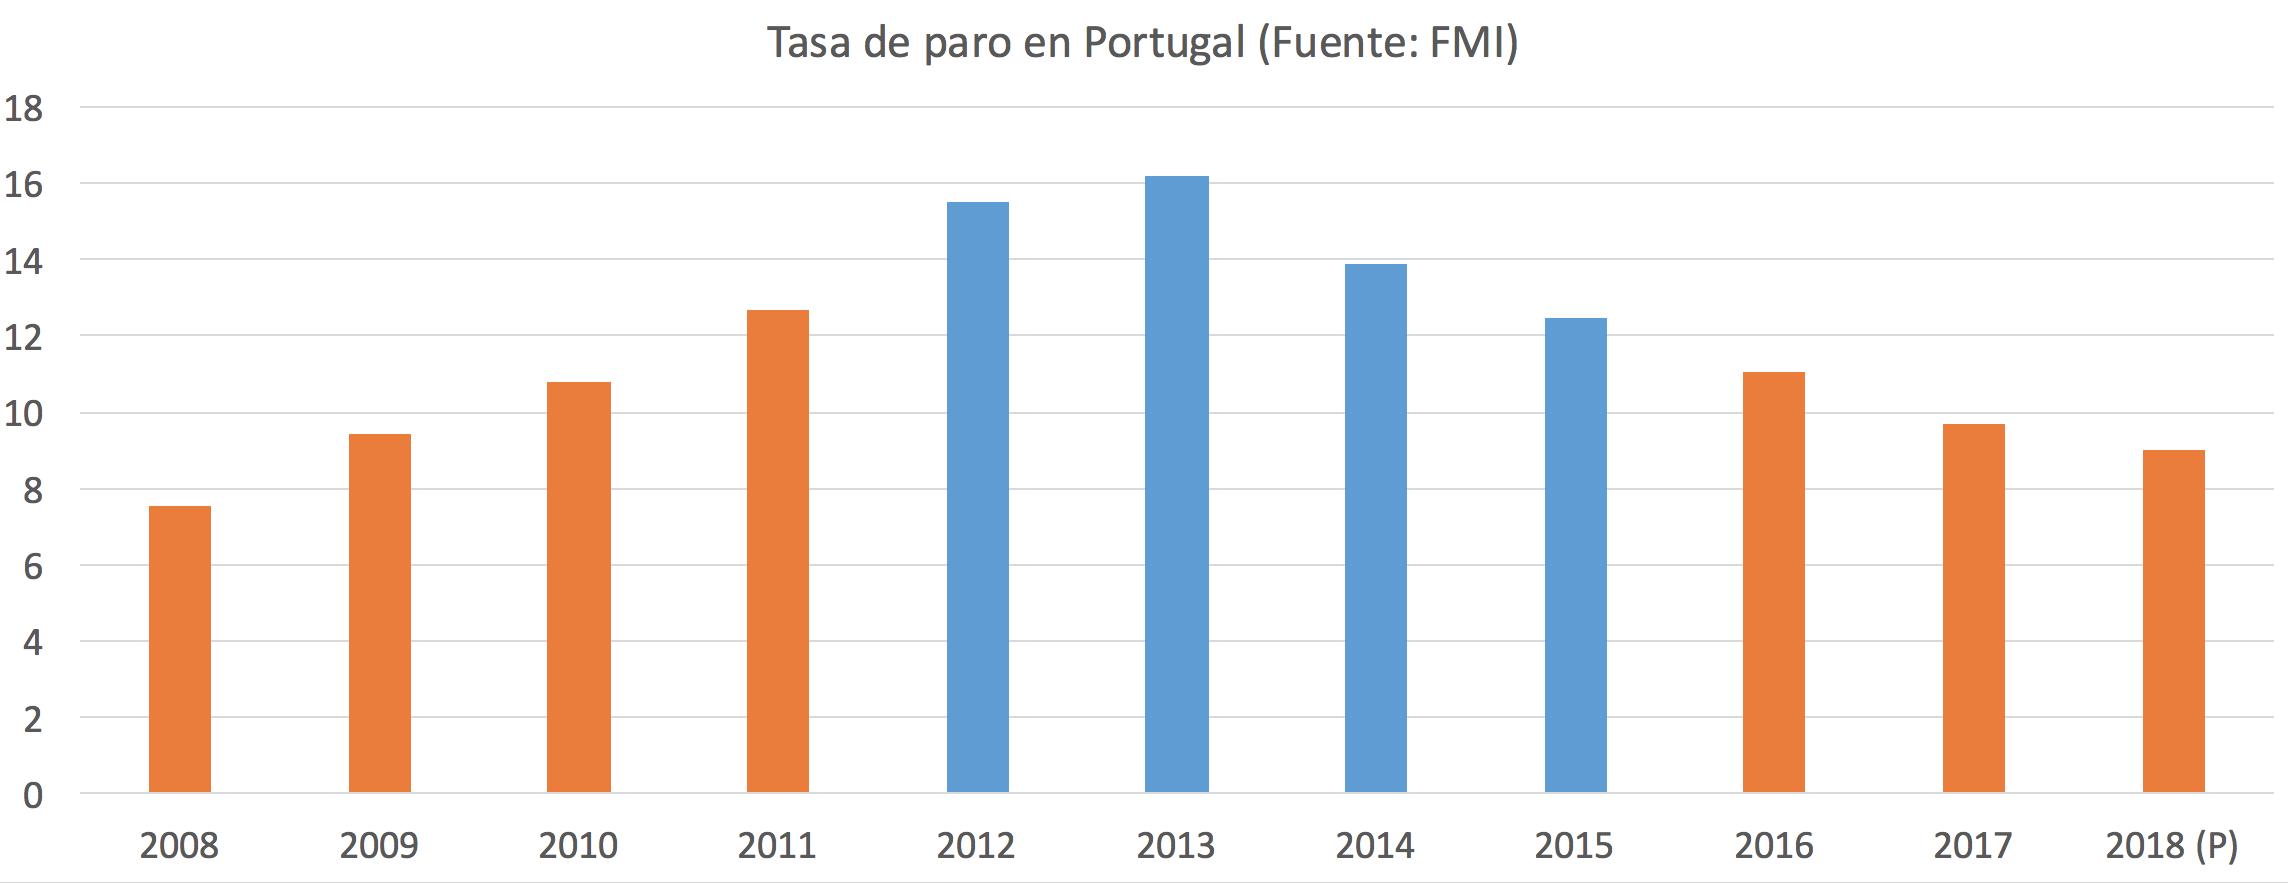 3-Tasa-de-paro-Portugal.png